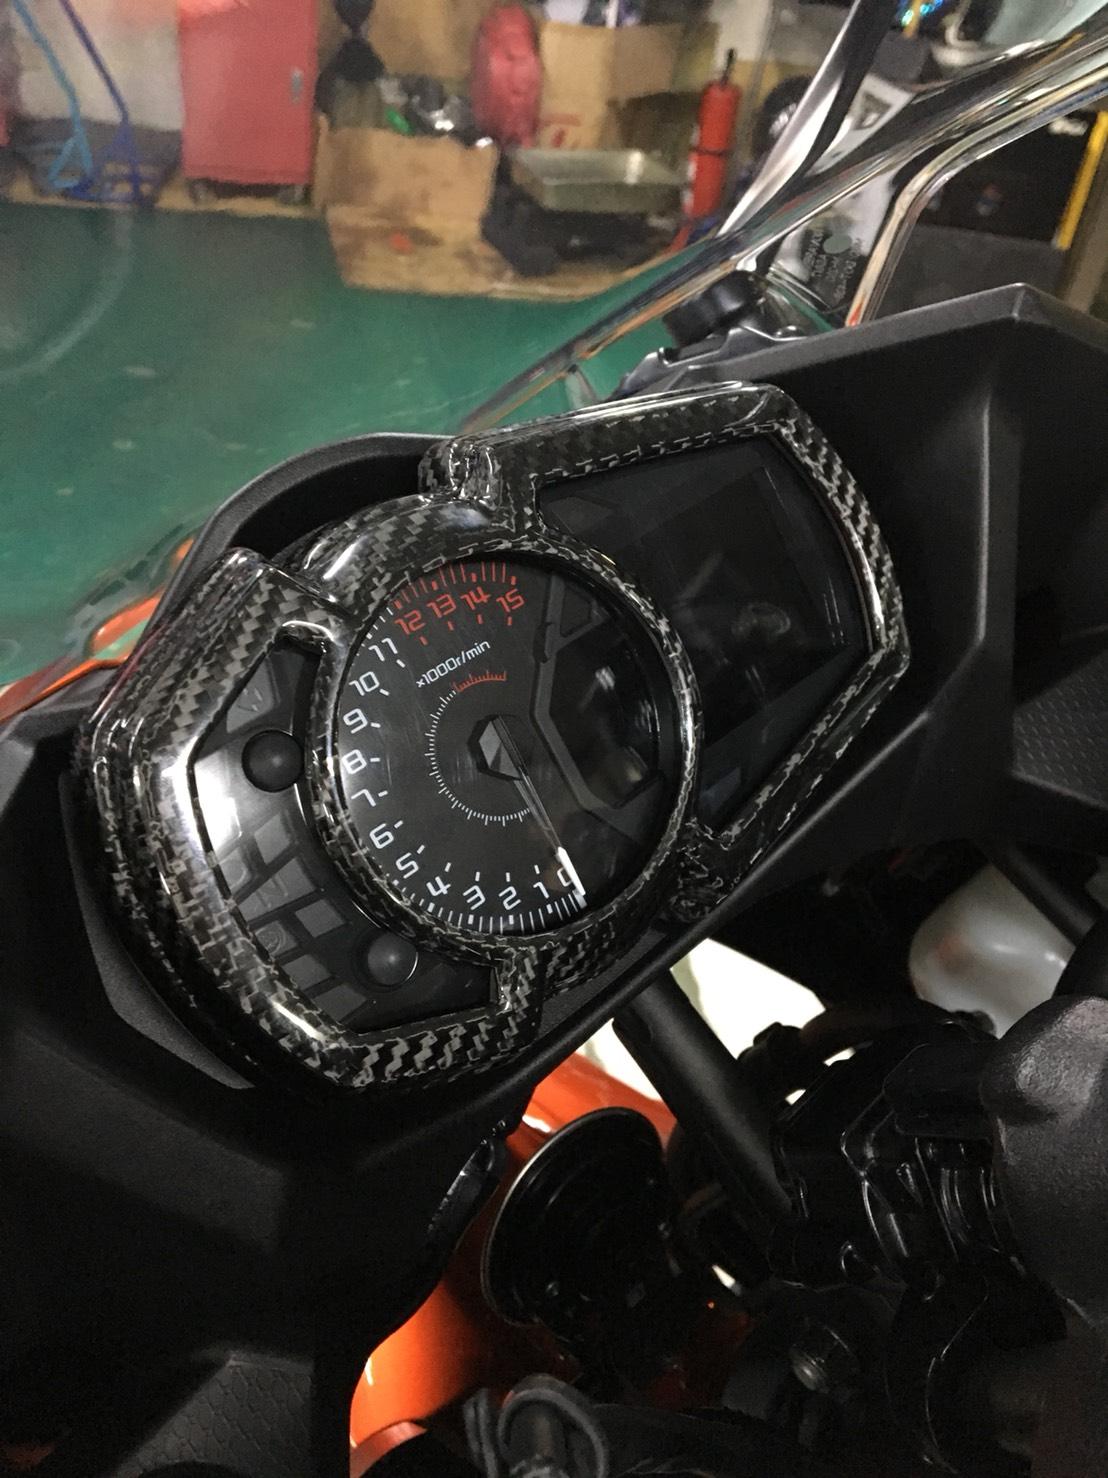 Carbon Fiber Instrument Panel Cover For Kawasaki Ninja 250 18 19 1000 Wiring Diagram 400 650 17 Zx 6r 2019